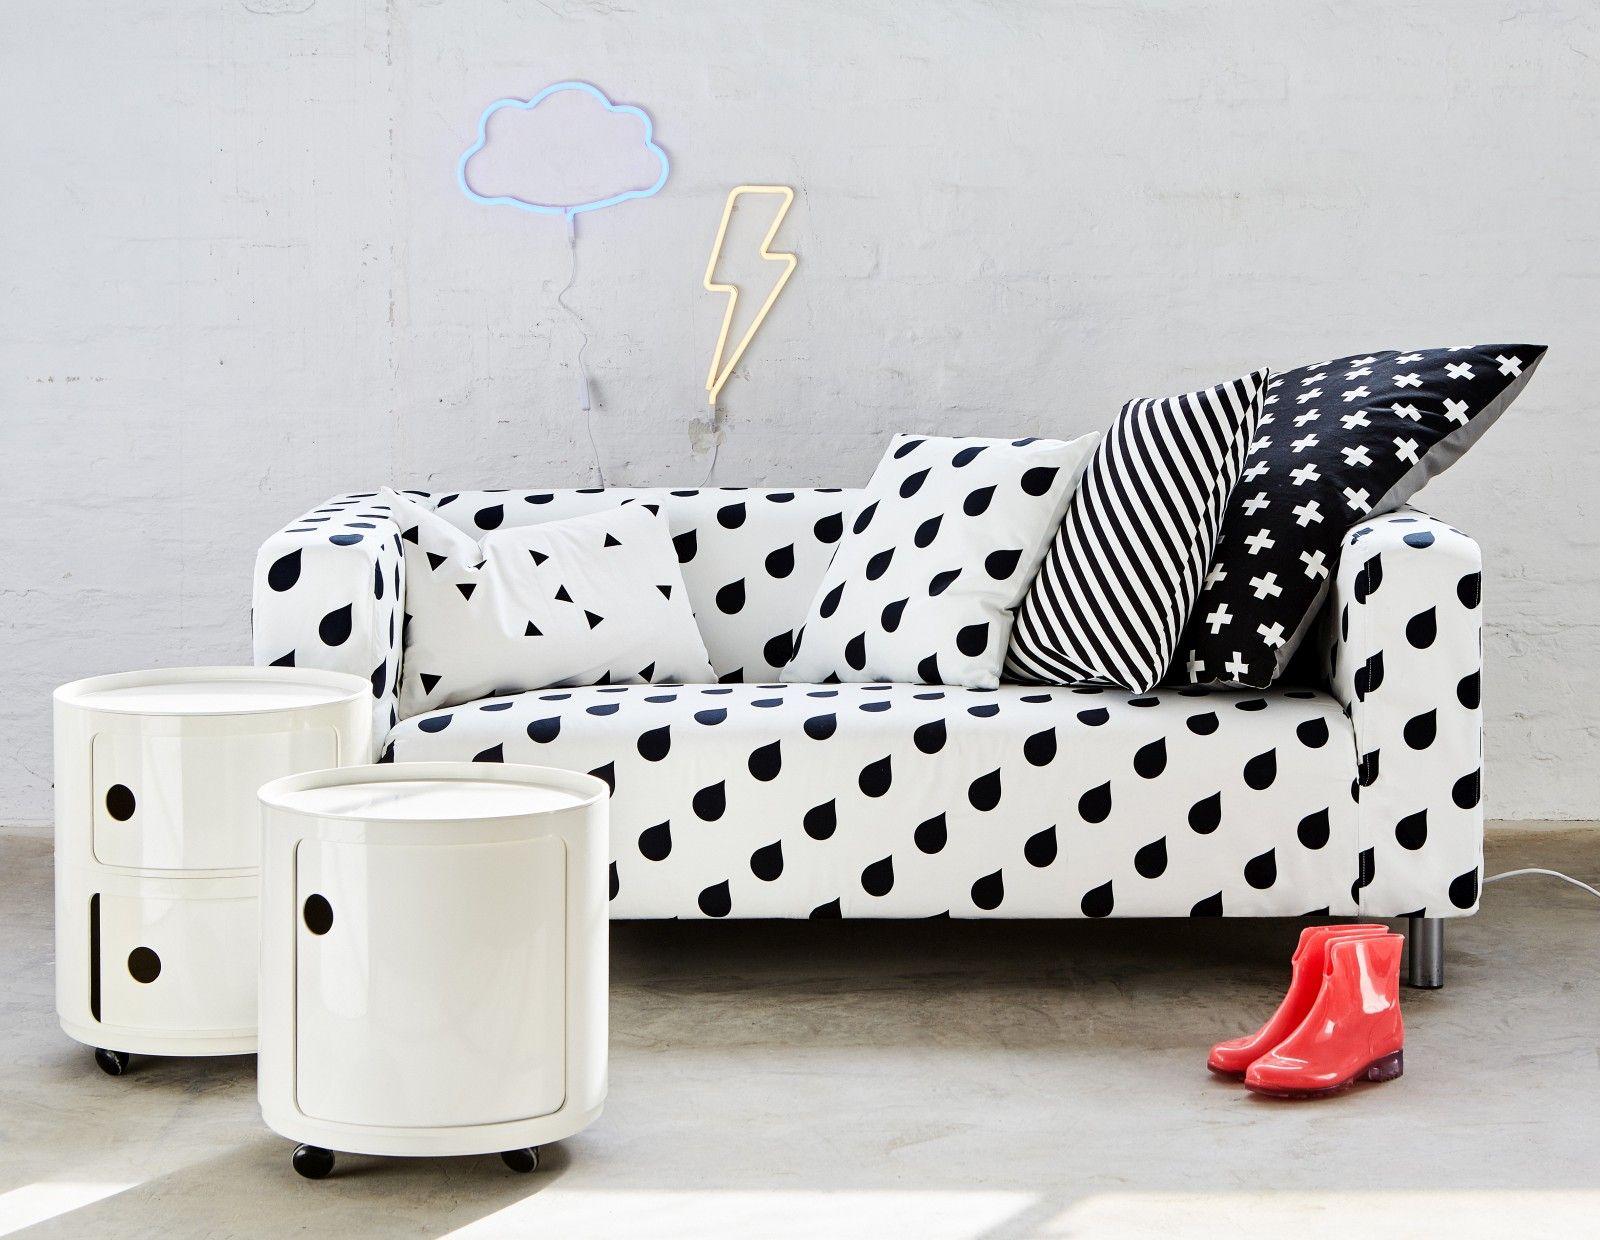 Water Drops Ikea Klippan Cover Cushions On Sofa Black And White Sofa Ikea Klippan Sofa